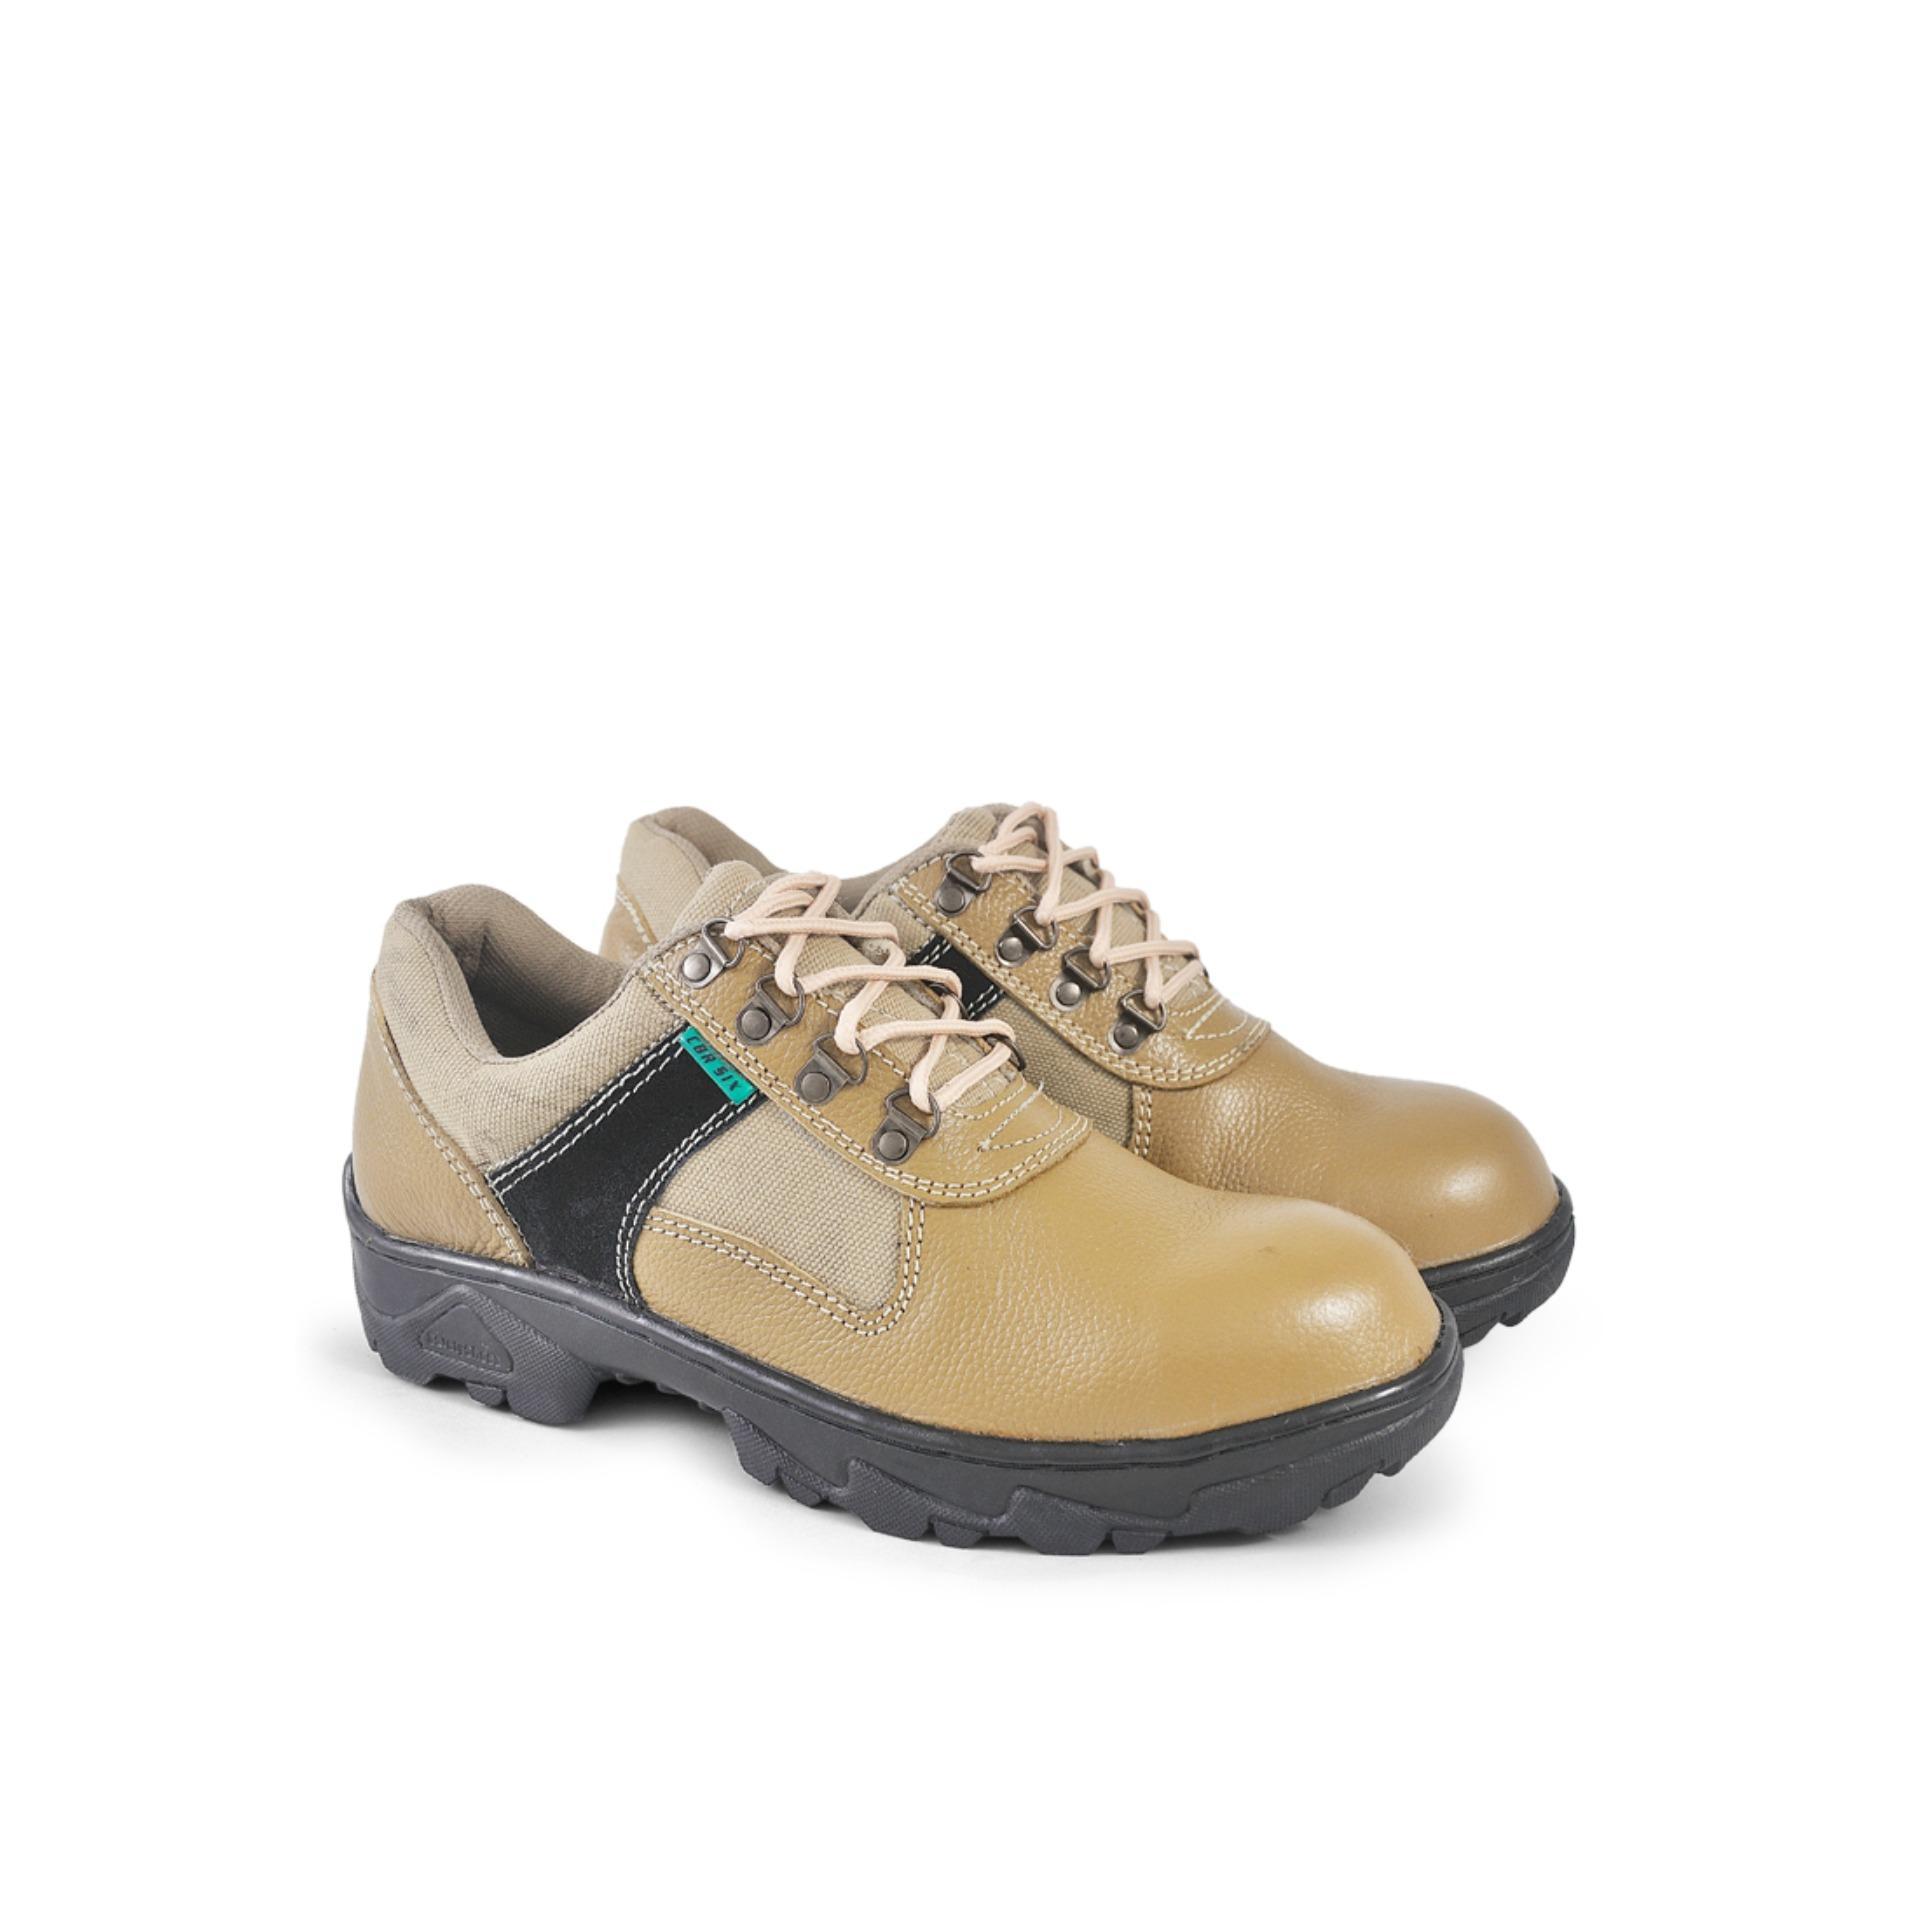 NIMO Sepatu Safety Pria HRC 379 - Tan 92926a1521